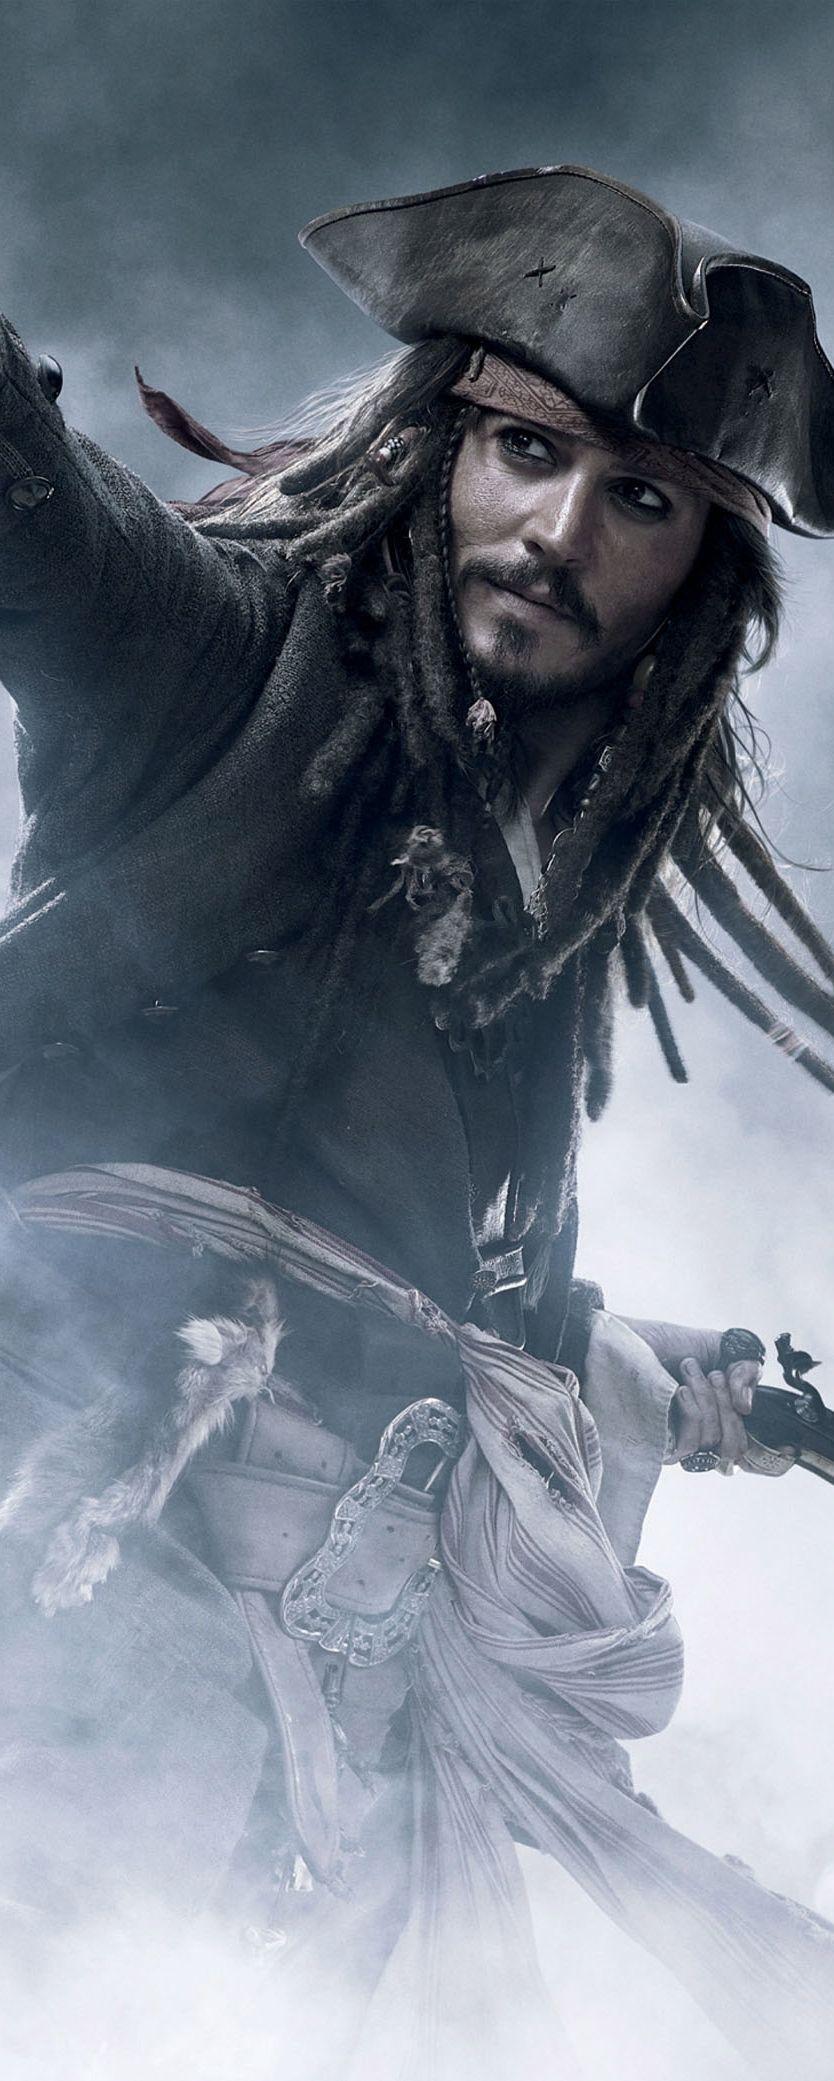 Capt Jack Sparrow Poster Jack Sparrow Wallpaper Captain Jack Sparrow Jack Sparrow